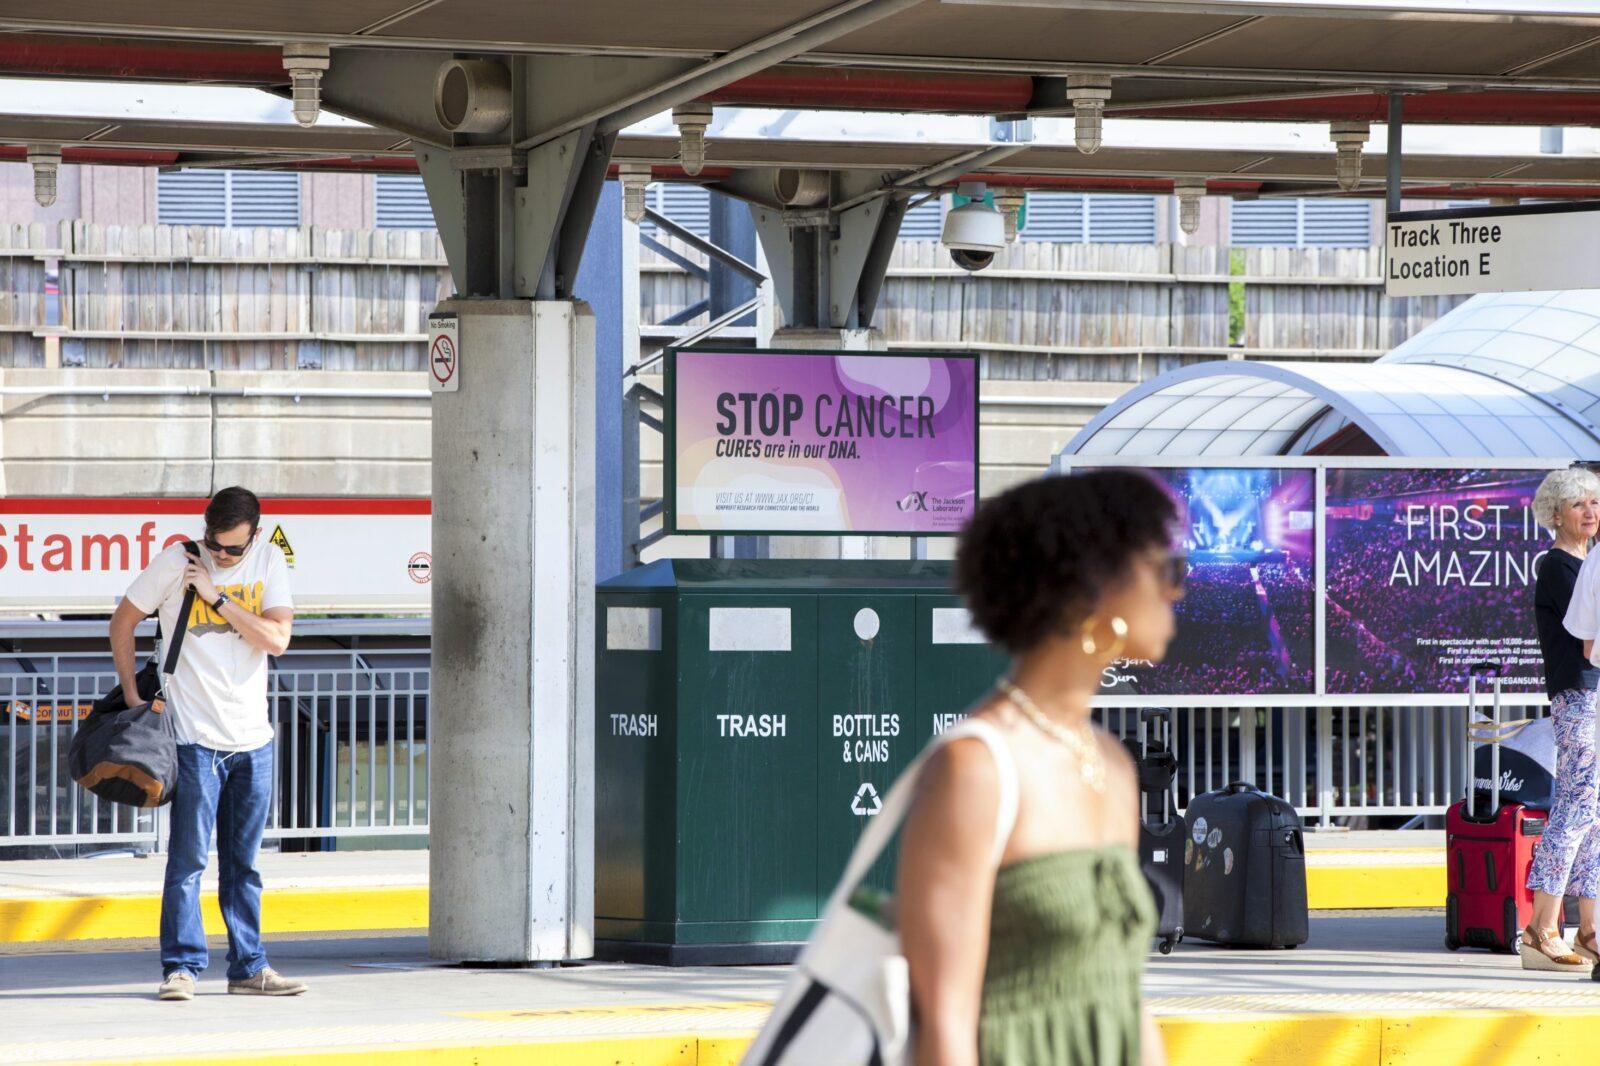 The Jackson Laboratory Stop Cancer Rail Platform Advertising